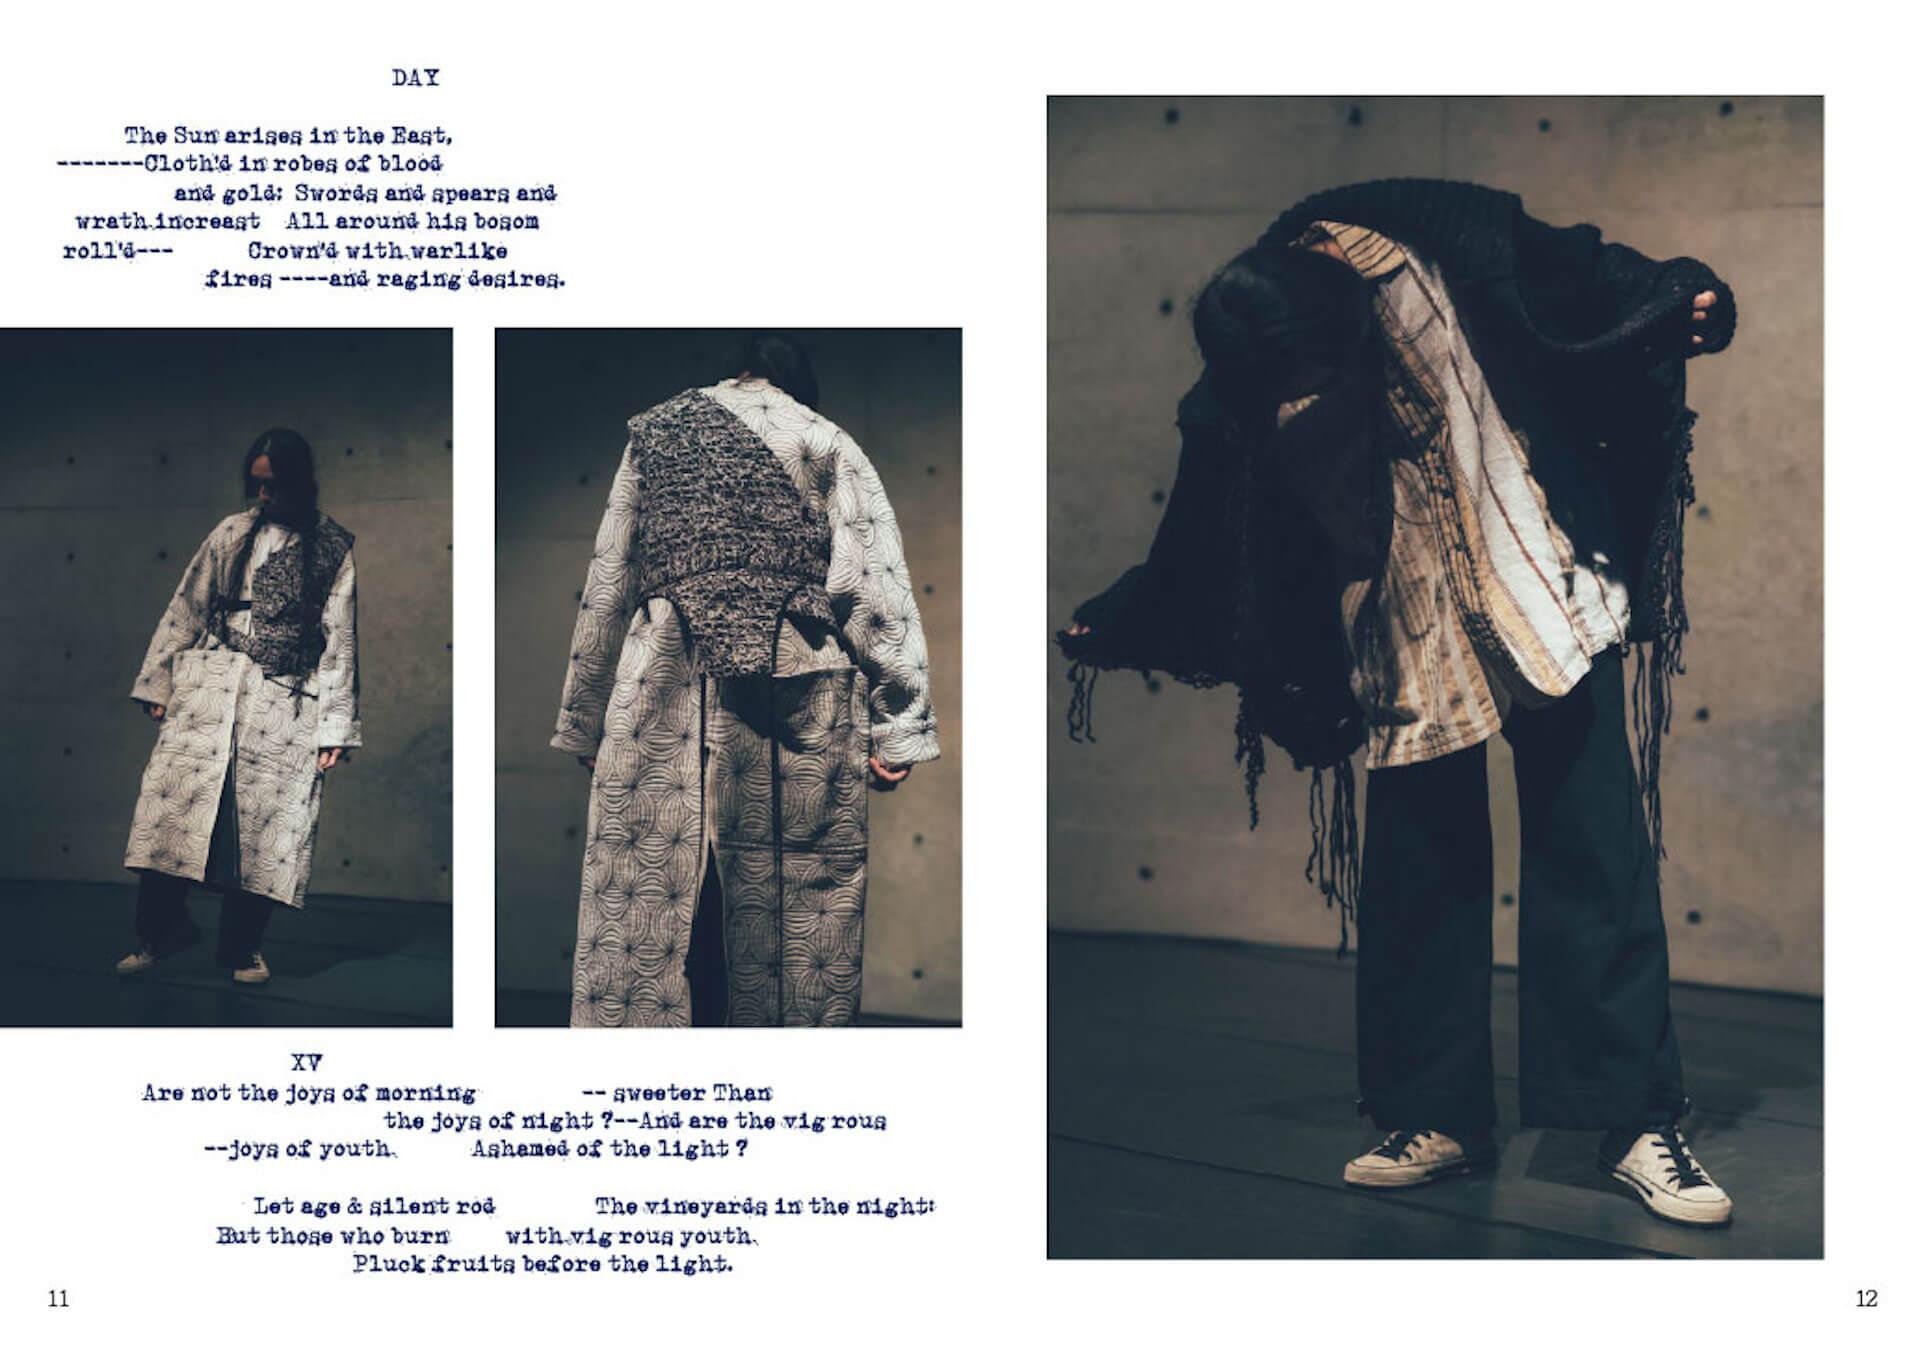 Lehの2020年秋冬コレクションがリリース|イメージモデルに山川冬樹、shimizu mash、elena midoriを起用。コレクションの撮影は水谷太郎。 life_fashion200913-leh-romantic-4